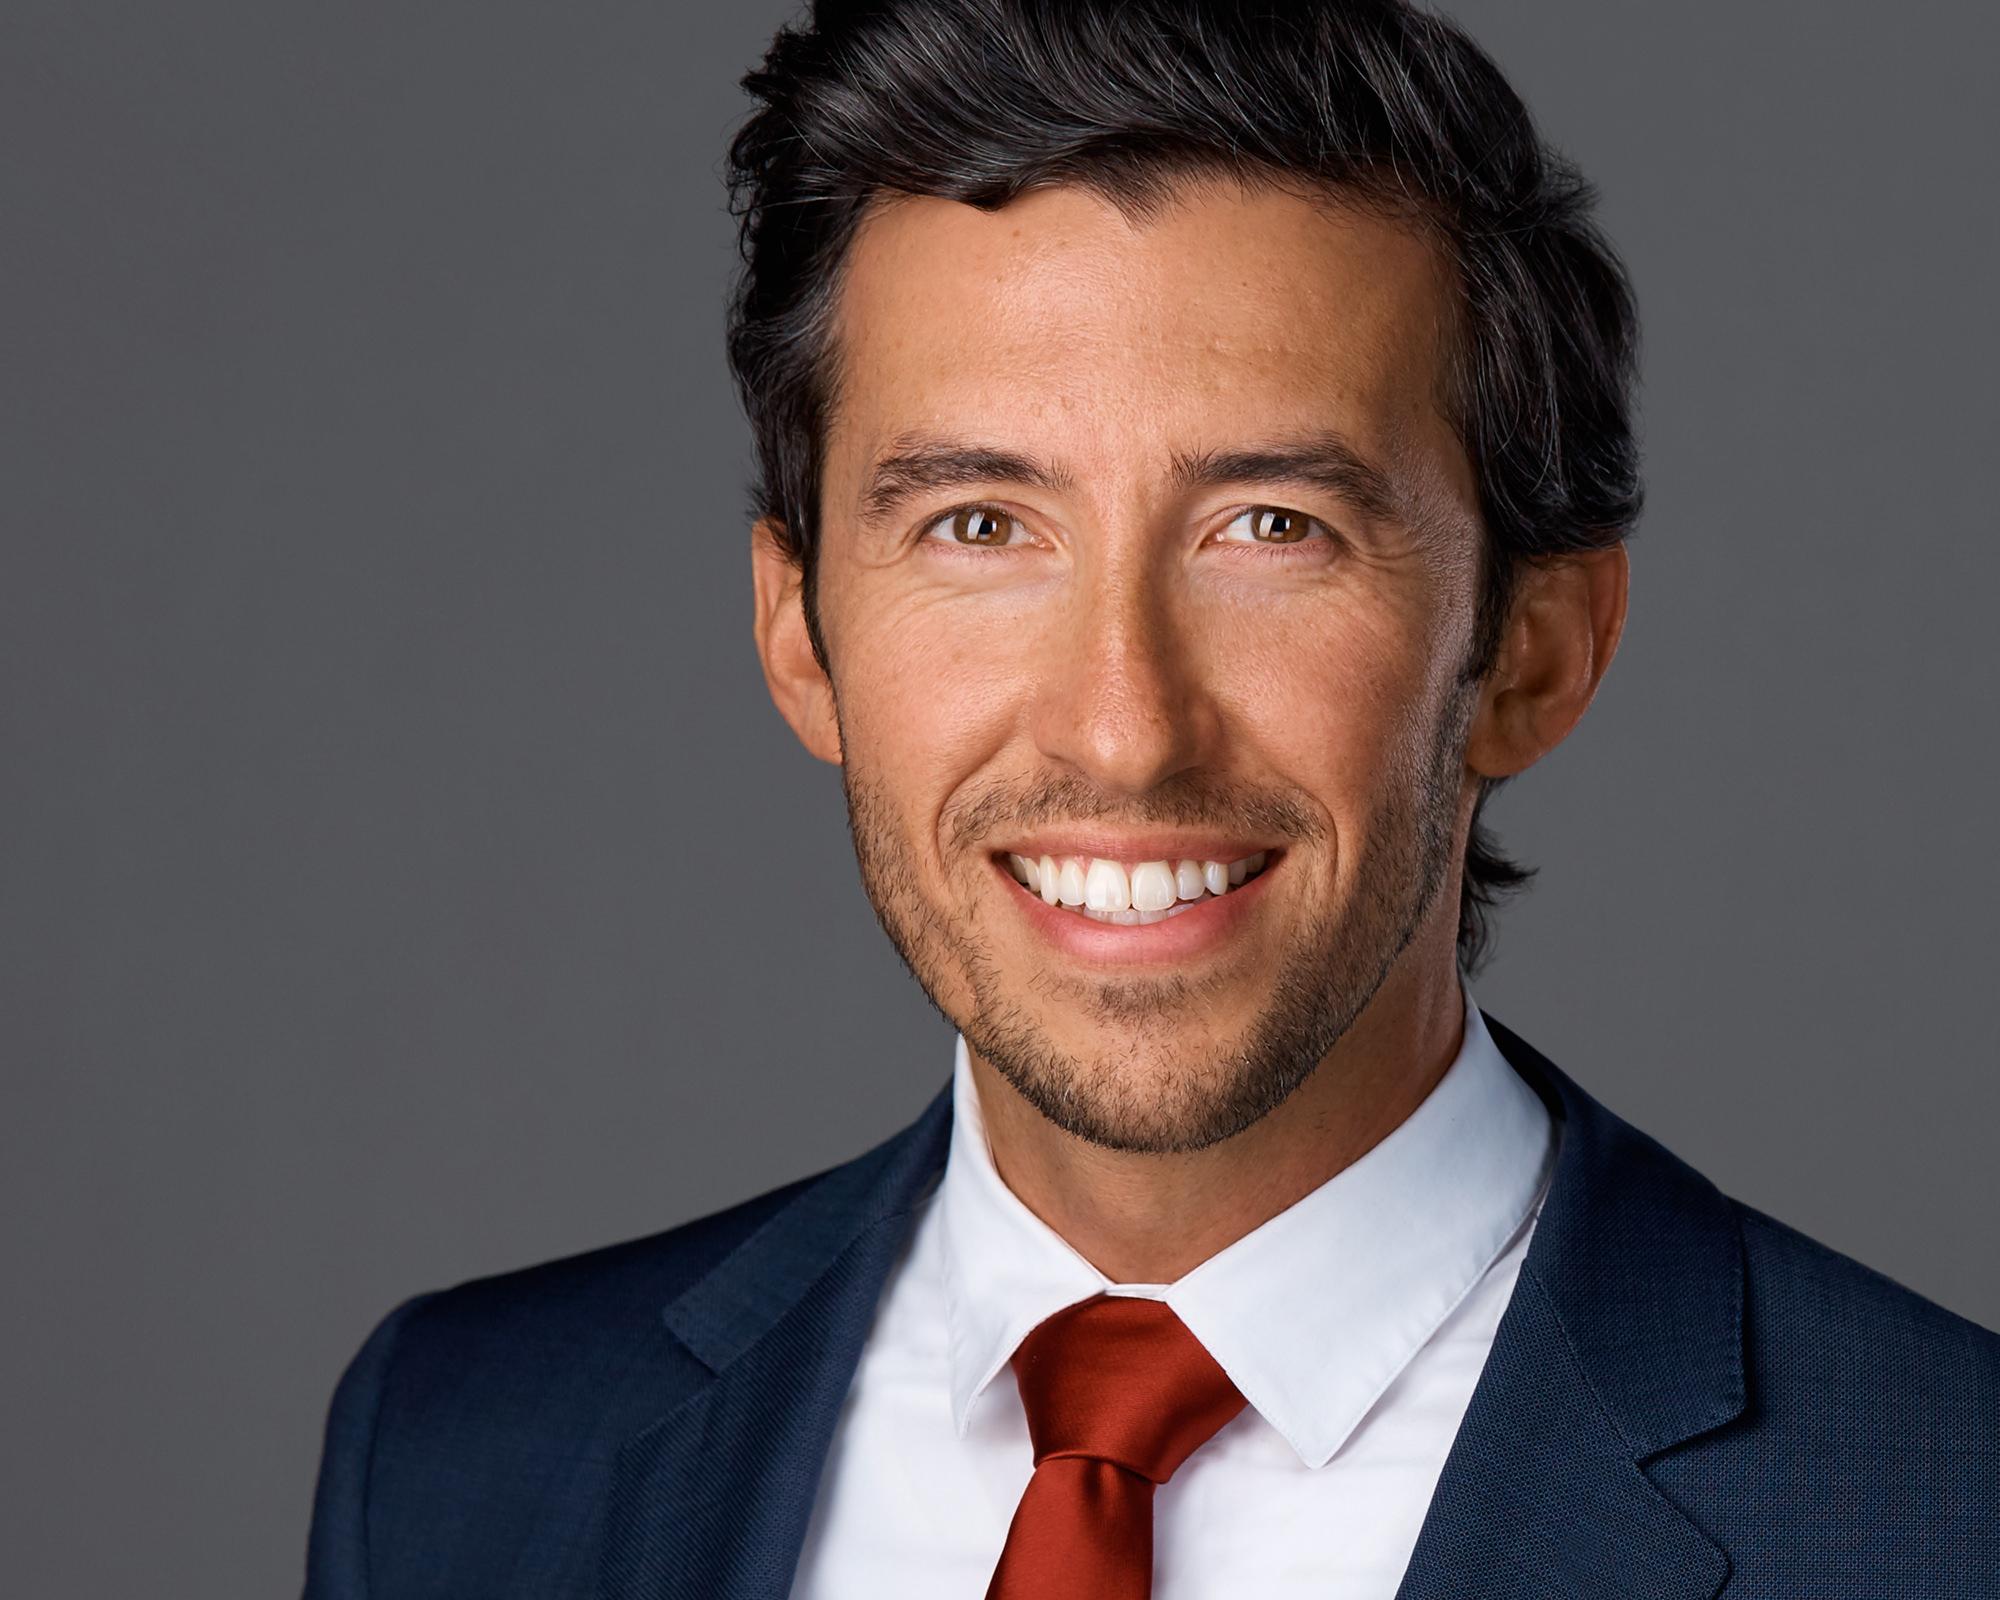 Mark-Panizzon-CIBC-Mortgage-Advisor-Ryan-Parker-Photography-Edmonton-Headshots-Alberta-Headshot-Portrait-Photographer-Corporate-Actor-Business-Professional-Acting-Studio-Calgary.jpg